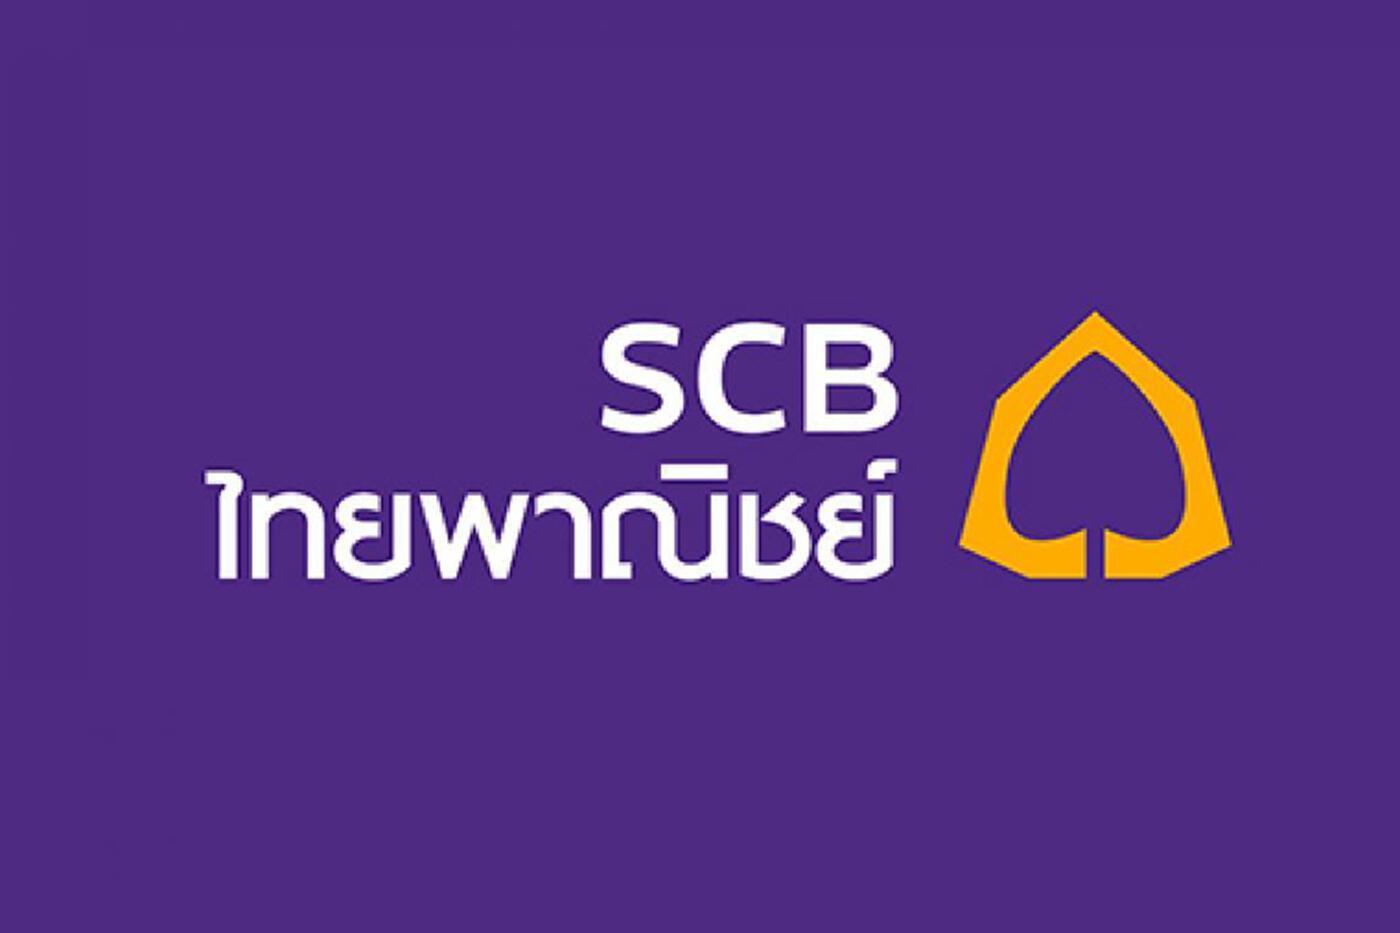 SCB ผนึก ADVANC รุกธุรกิจสินเชื่อผ่านดิจิทัลแพลตฟอร์ม